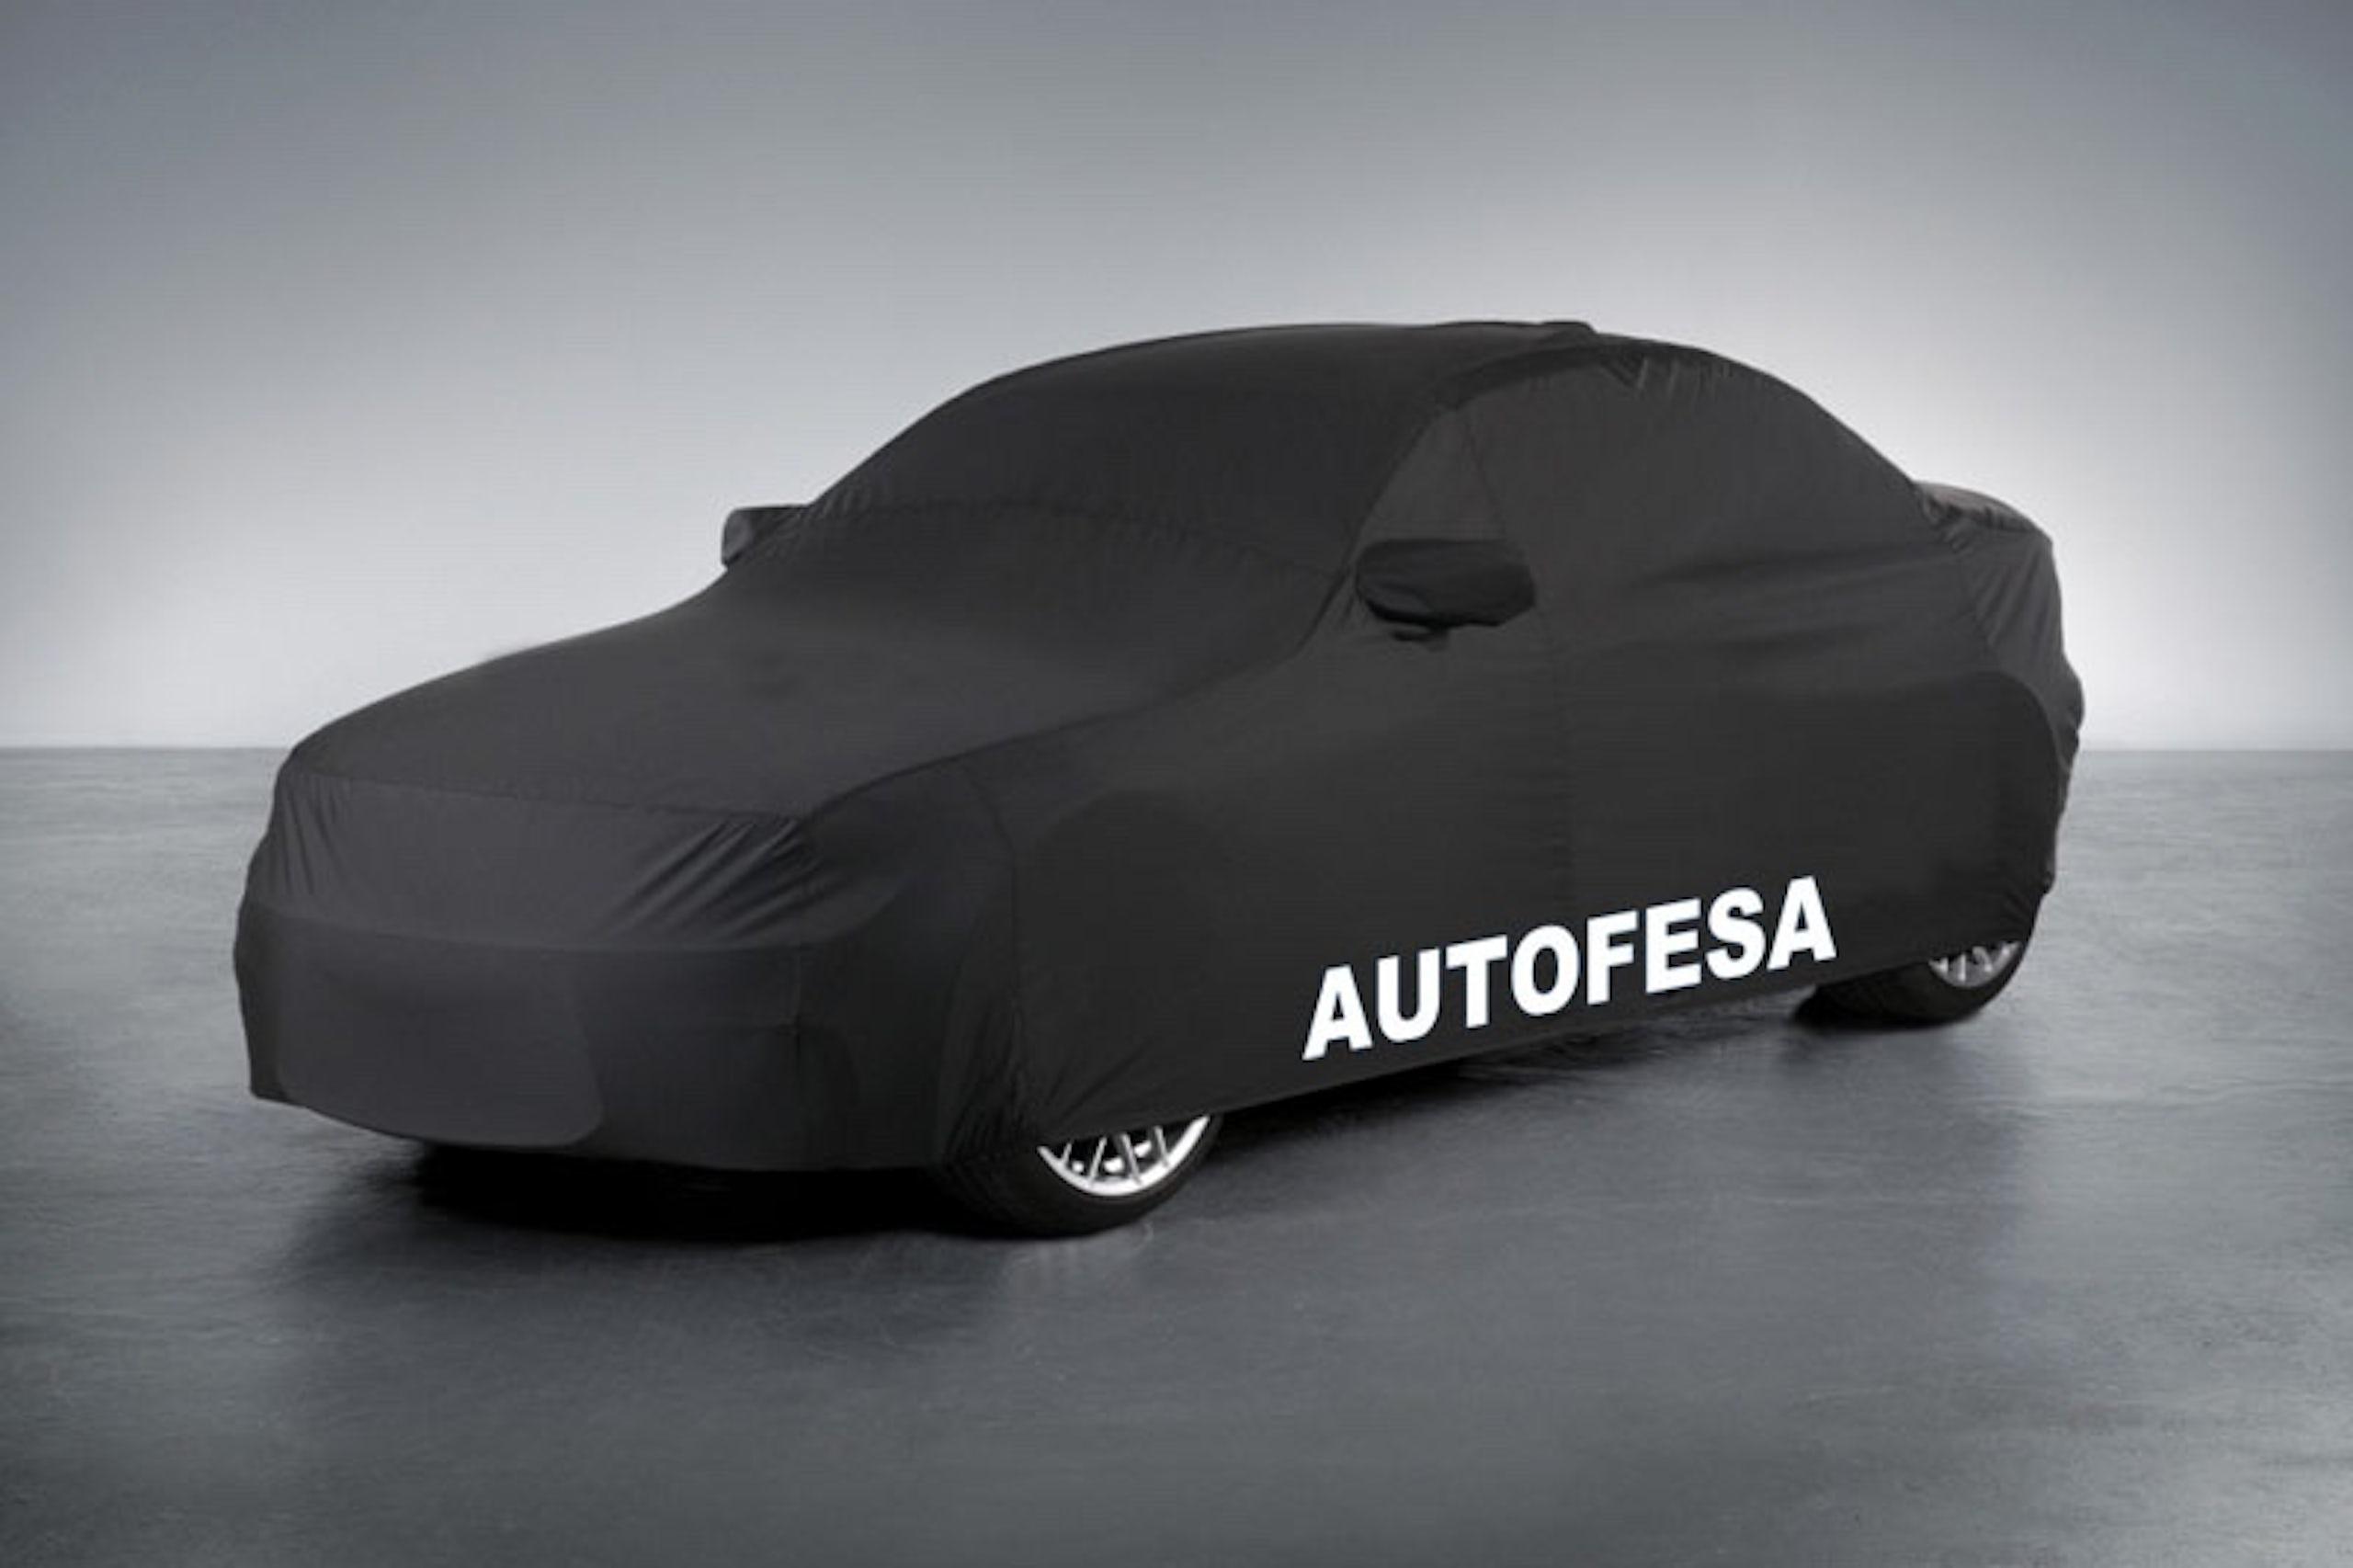 Audi A6 A6Avant COMPETITION ABT 3.0 TDI V6 T 326cv quattro 5p S tronic 4x4 Cpmpetition ABT S/S - Foto 5